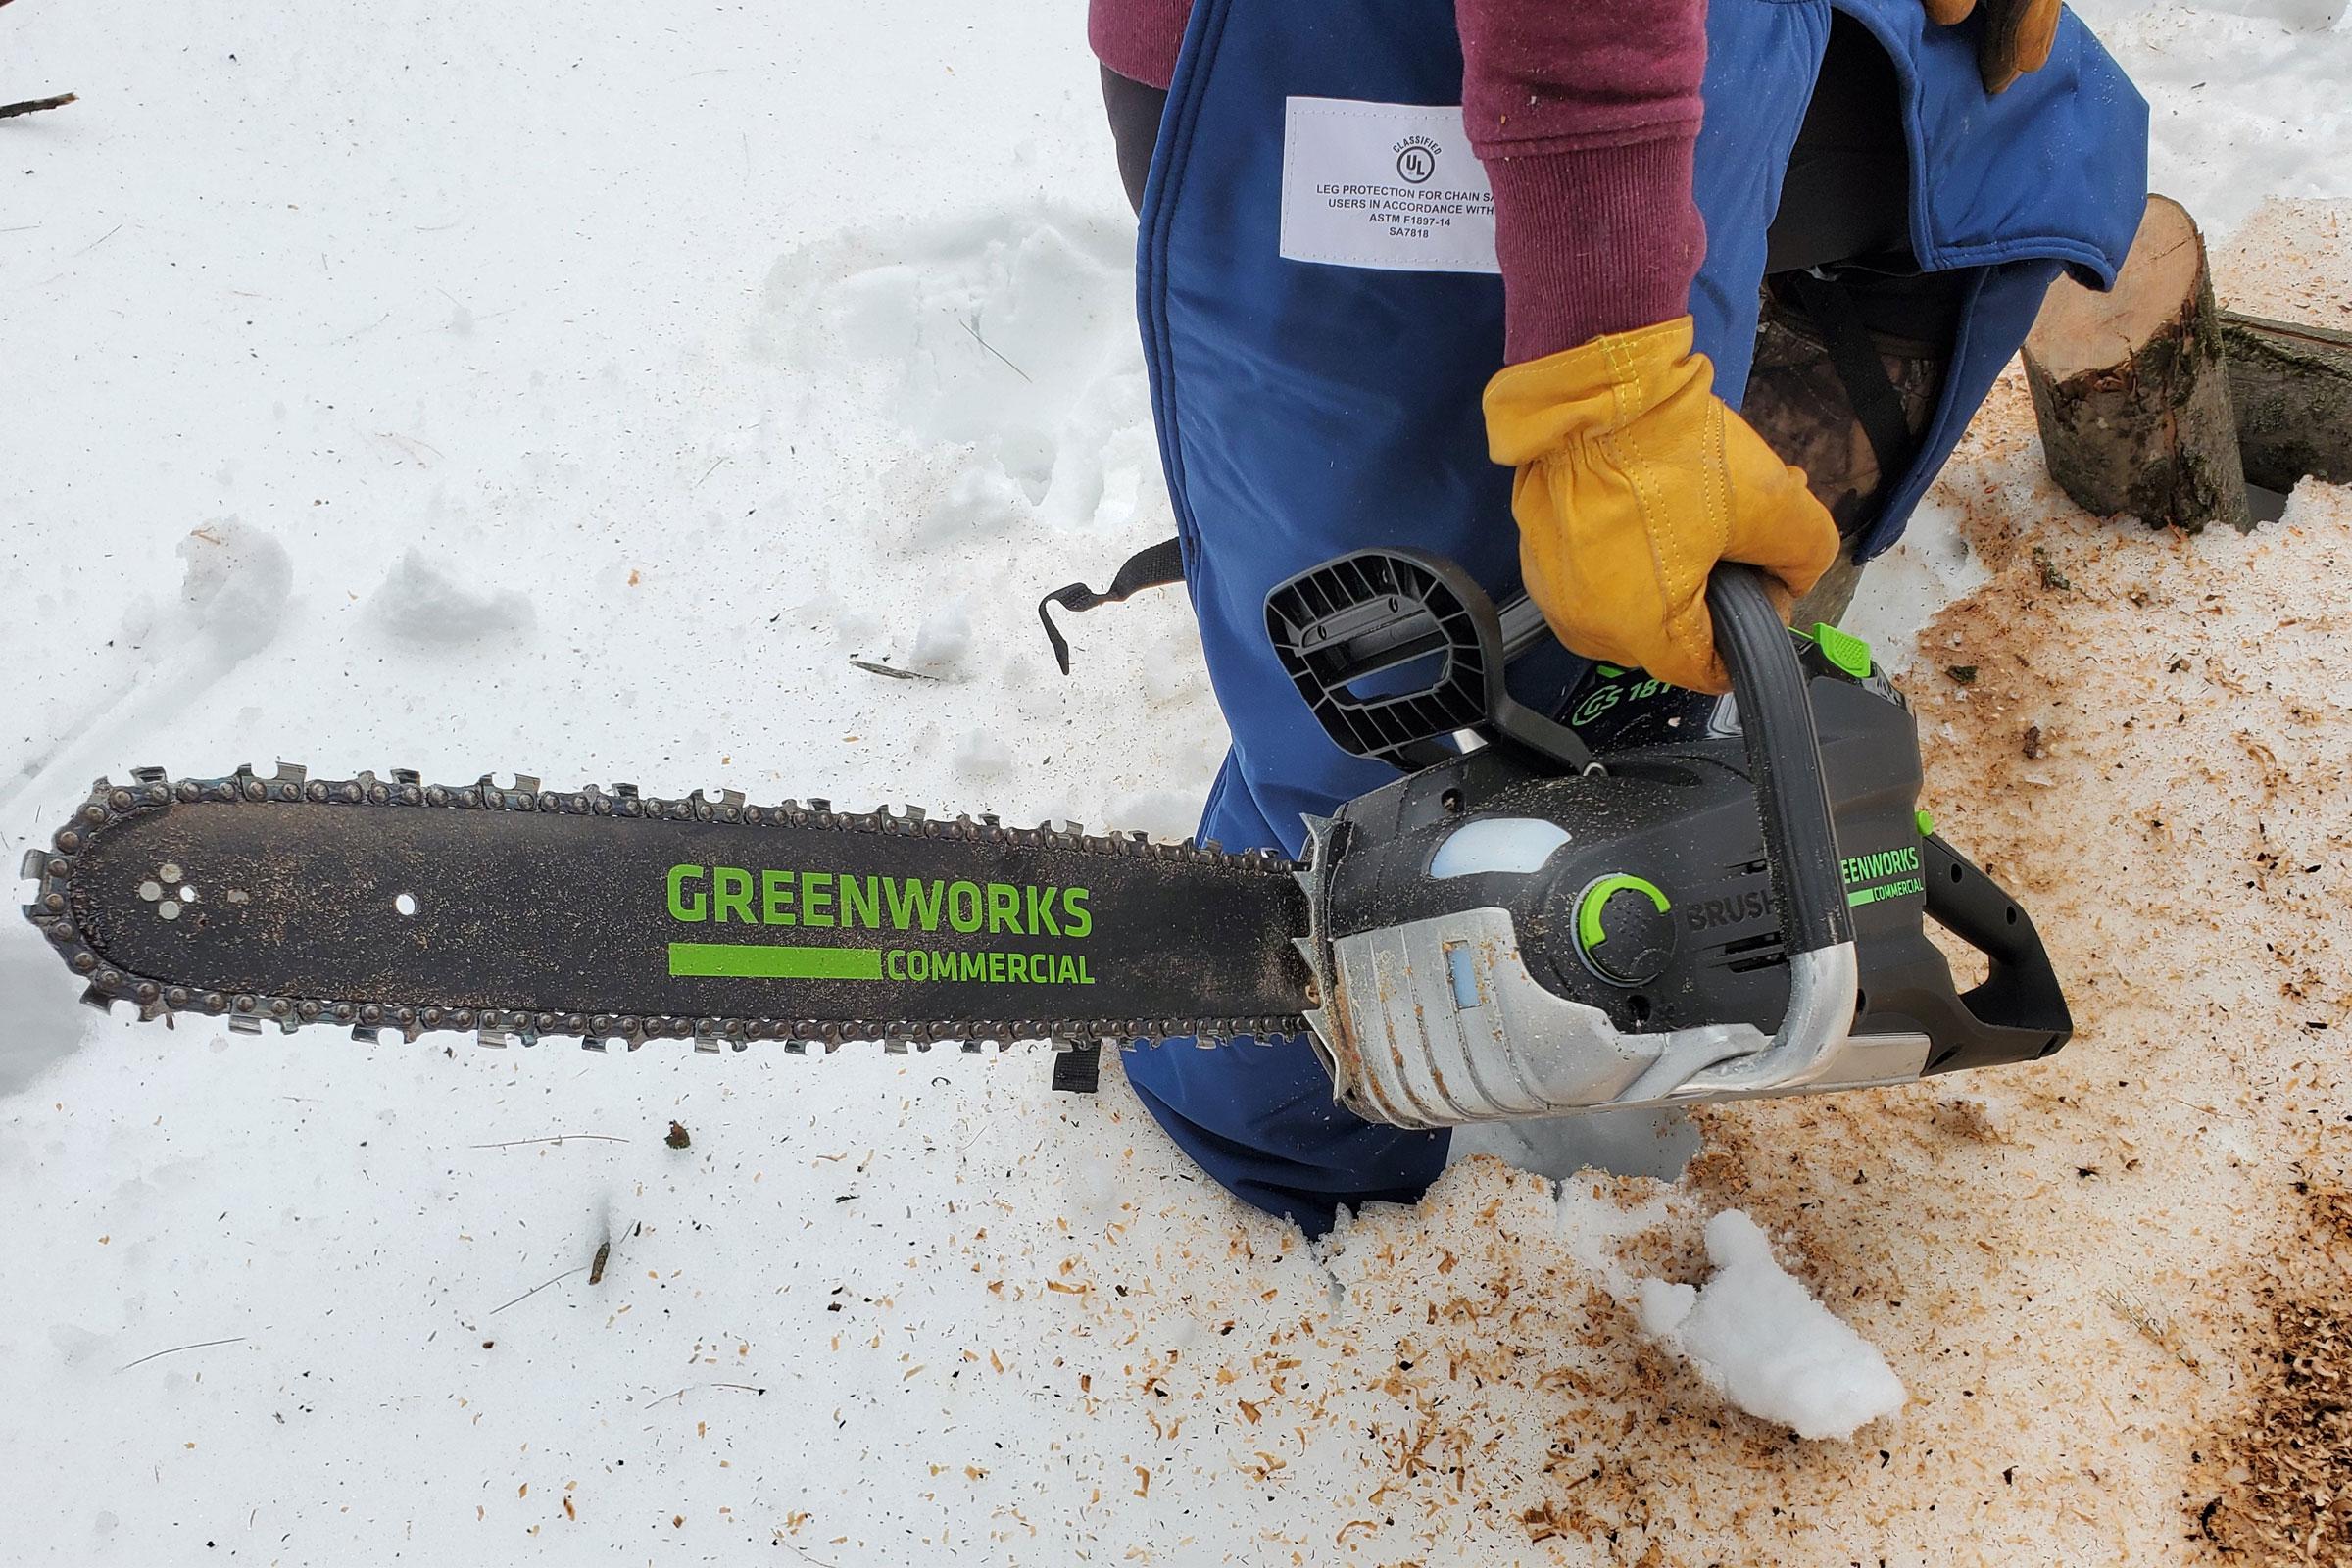 greenworks gs181 82v chainsaw